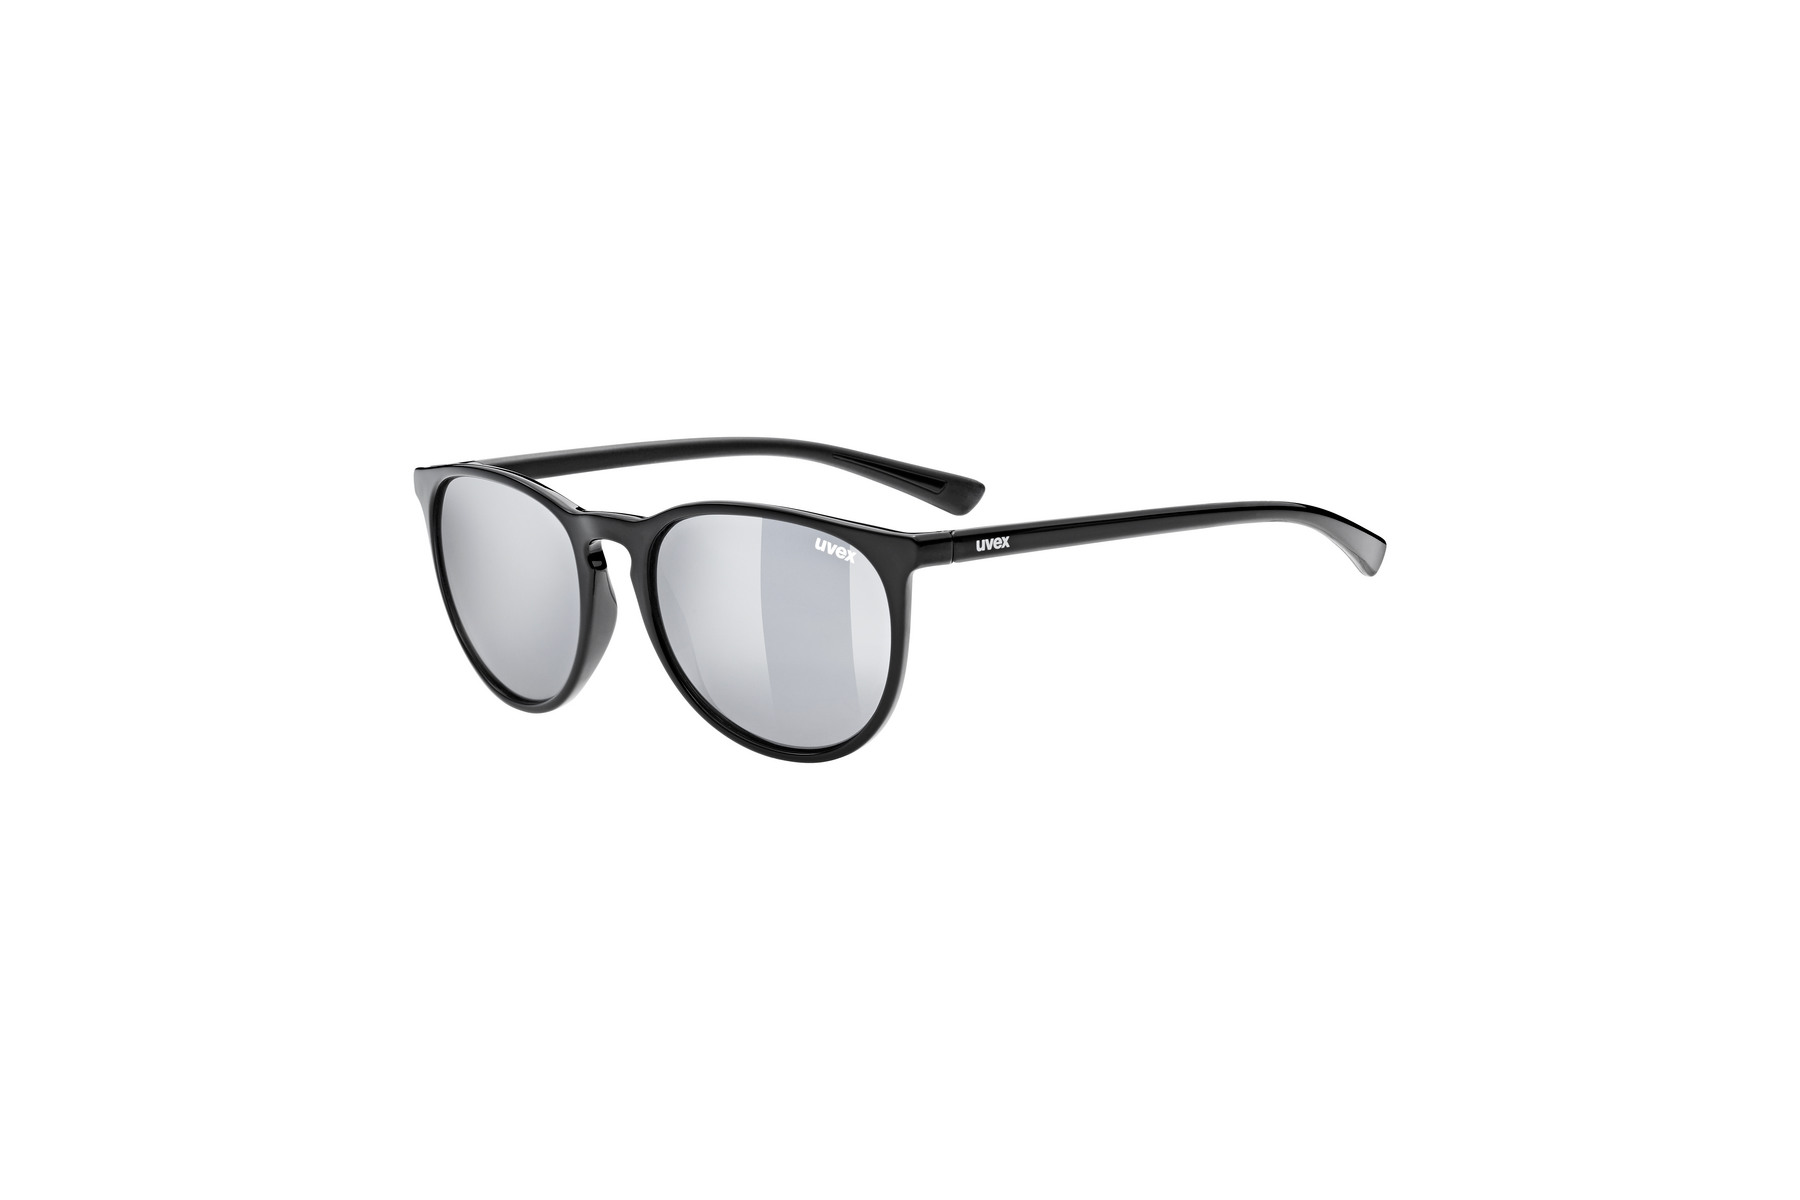 uvex lgl 43 Sonnenbrille